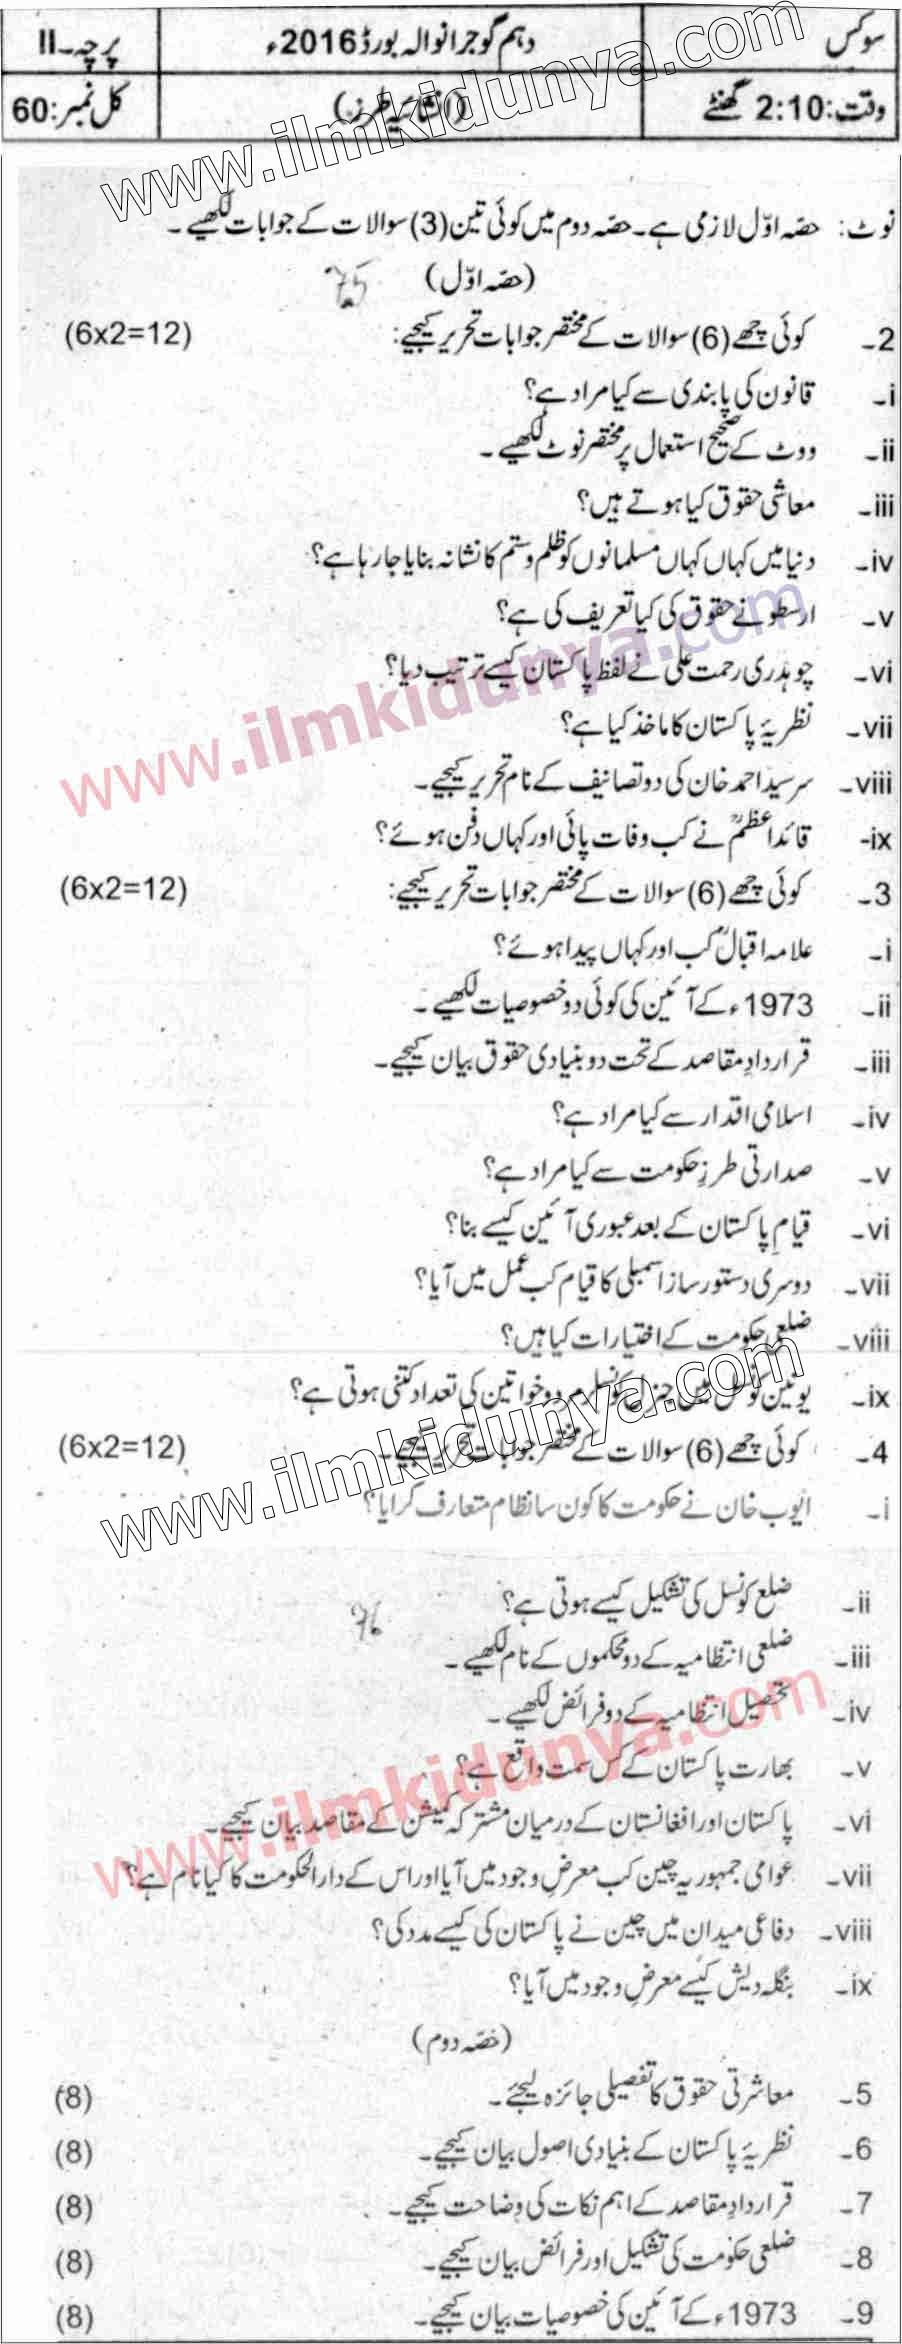 Past Papers 2016 Gujranwala Board 10th Class Civics Urdu